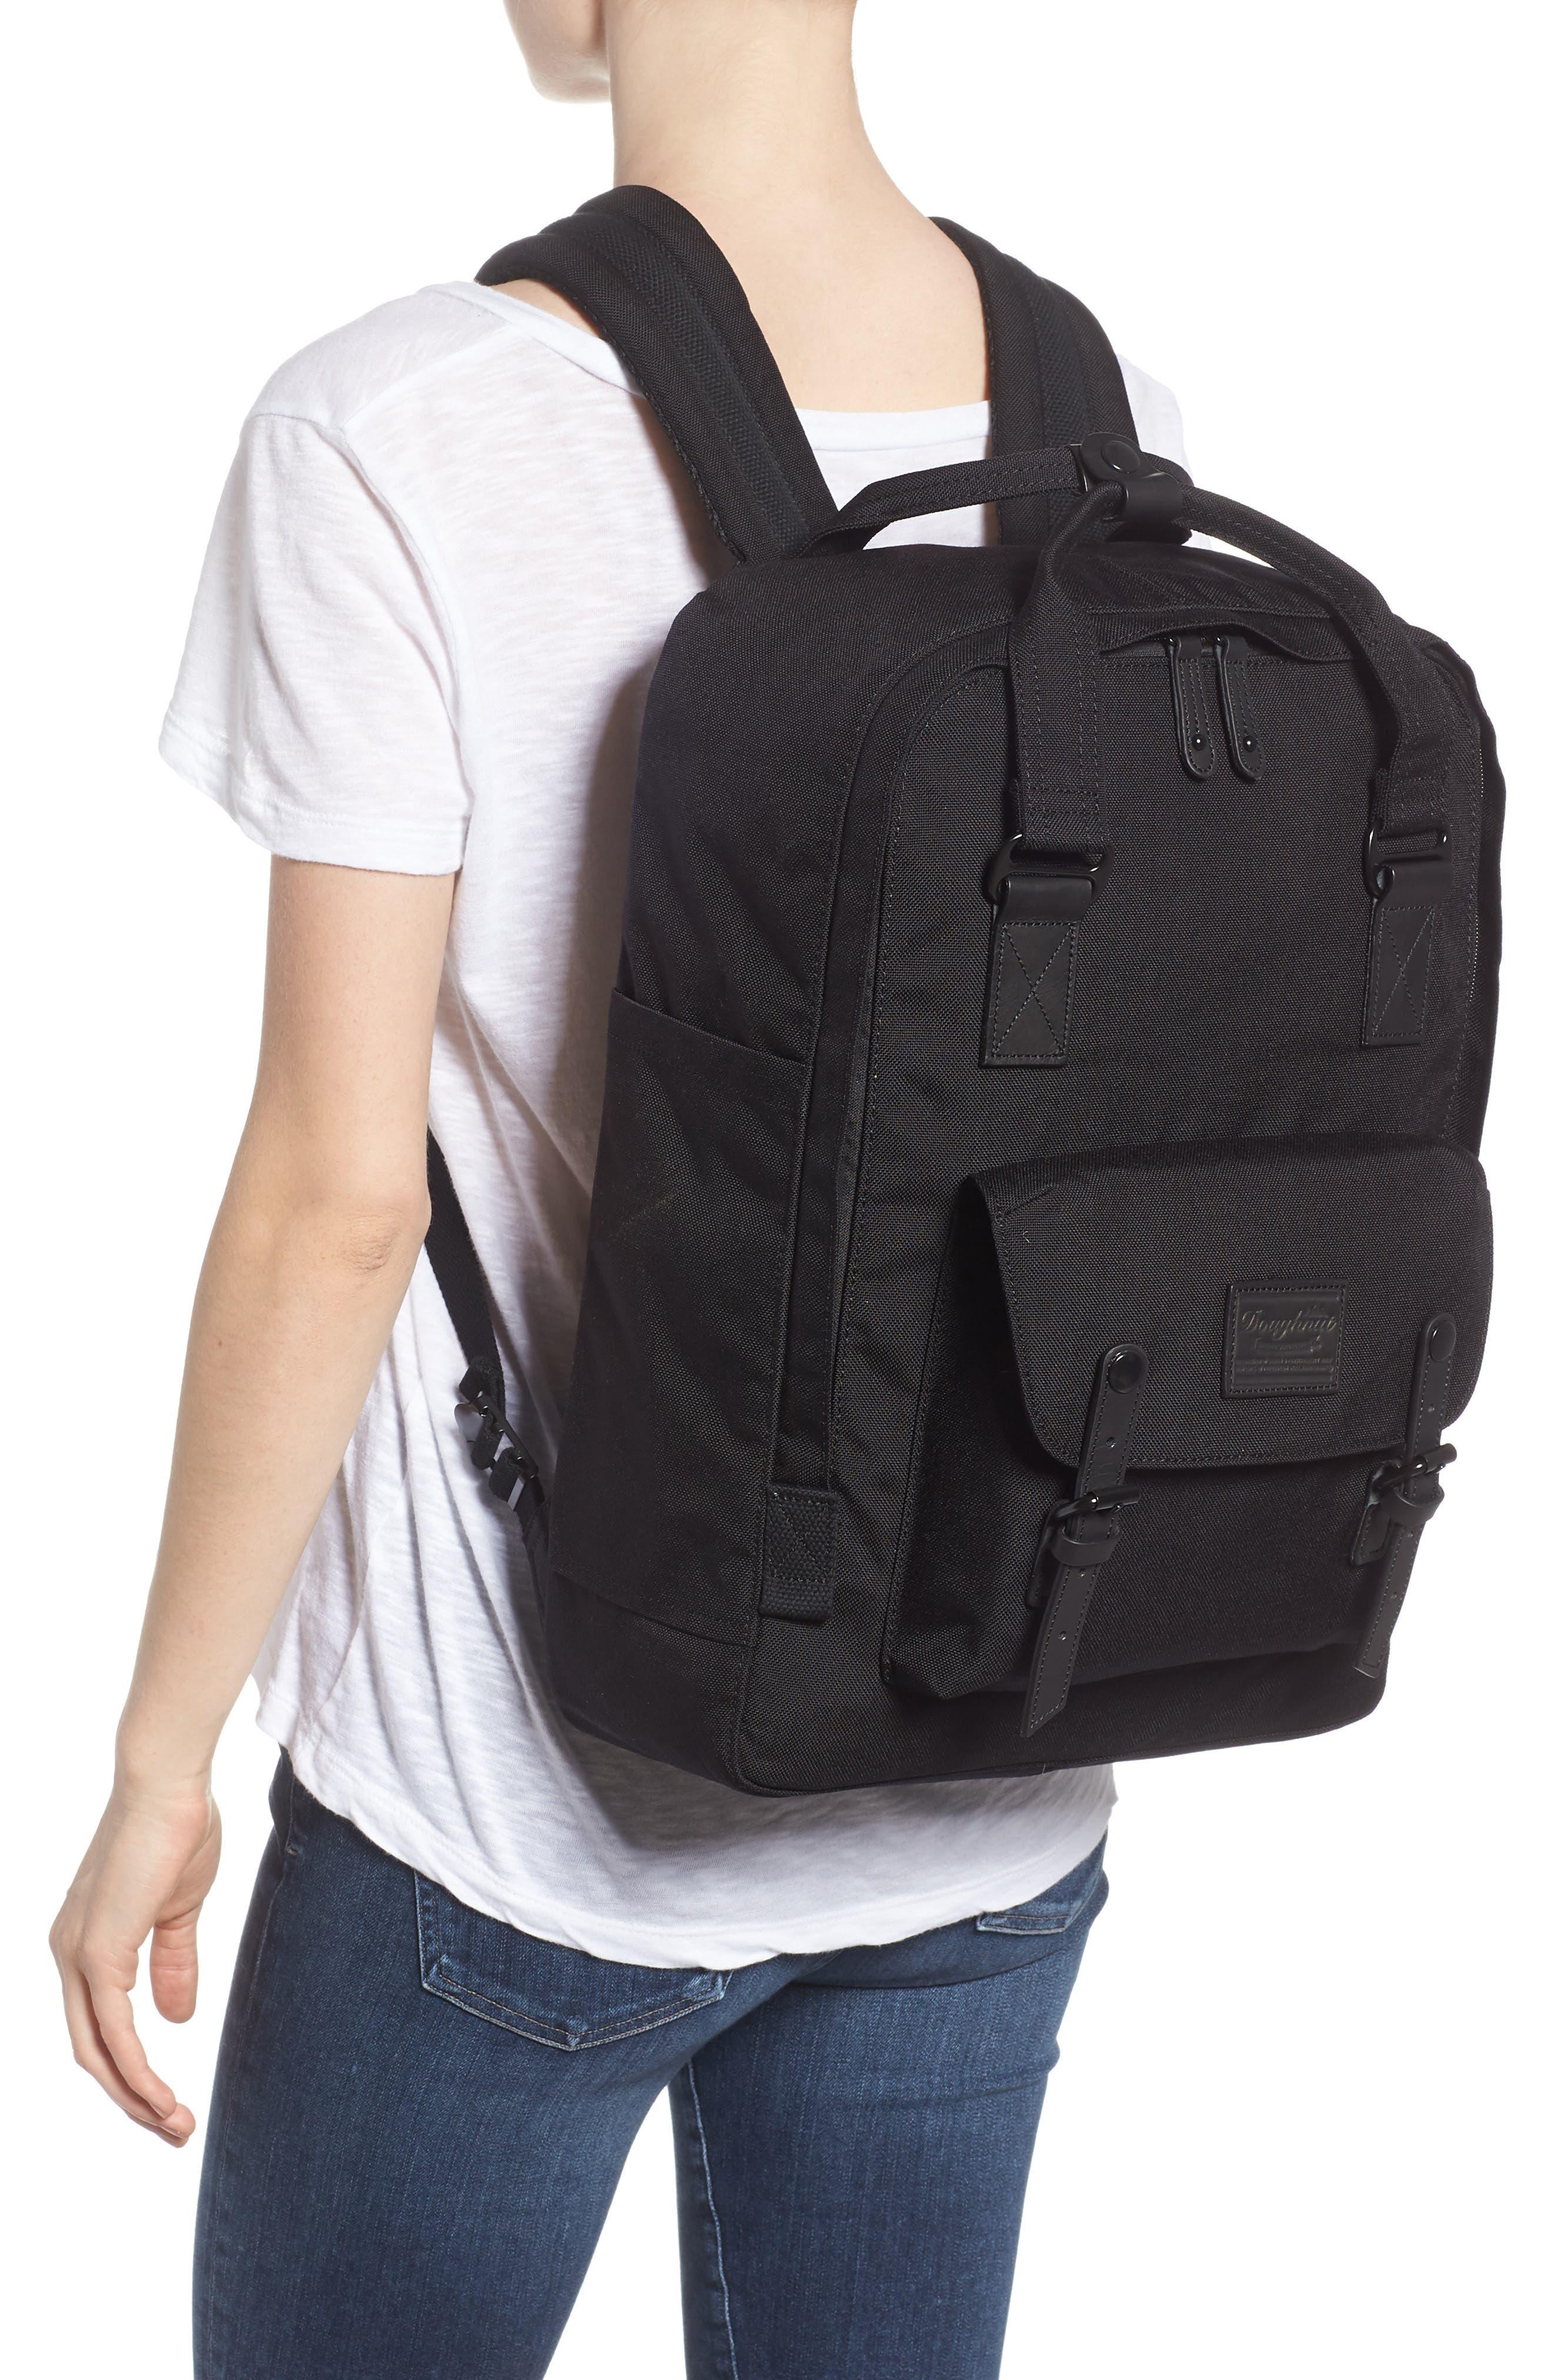 Macaroon Large Cordura<sup>®</sup> Black Series Water Repellent Backpack,                             Alternate thumbnail 2, color,                             001